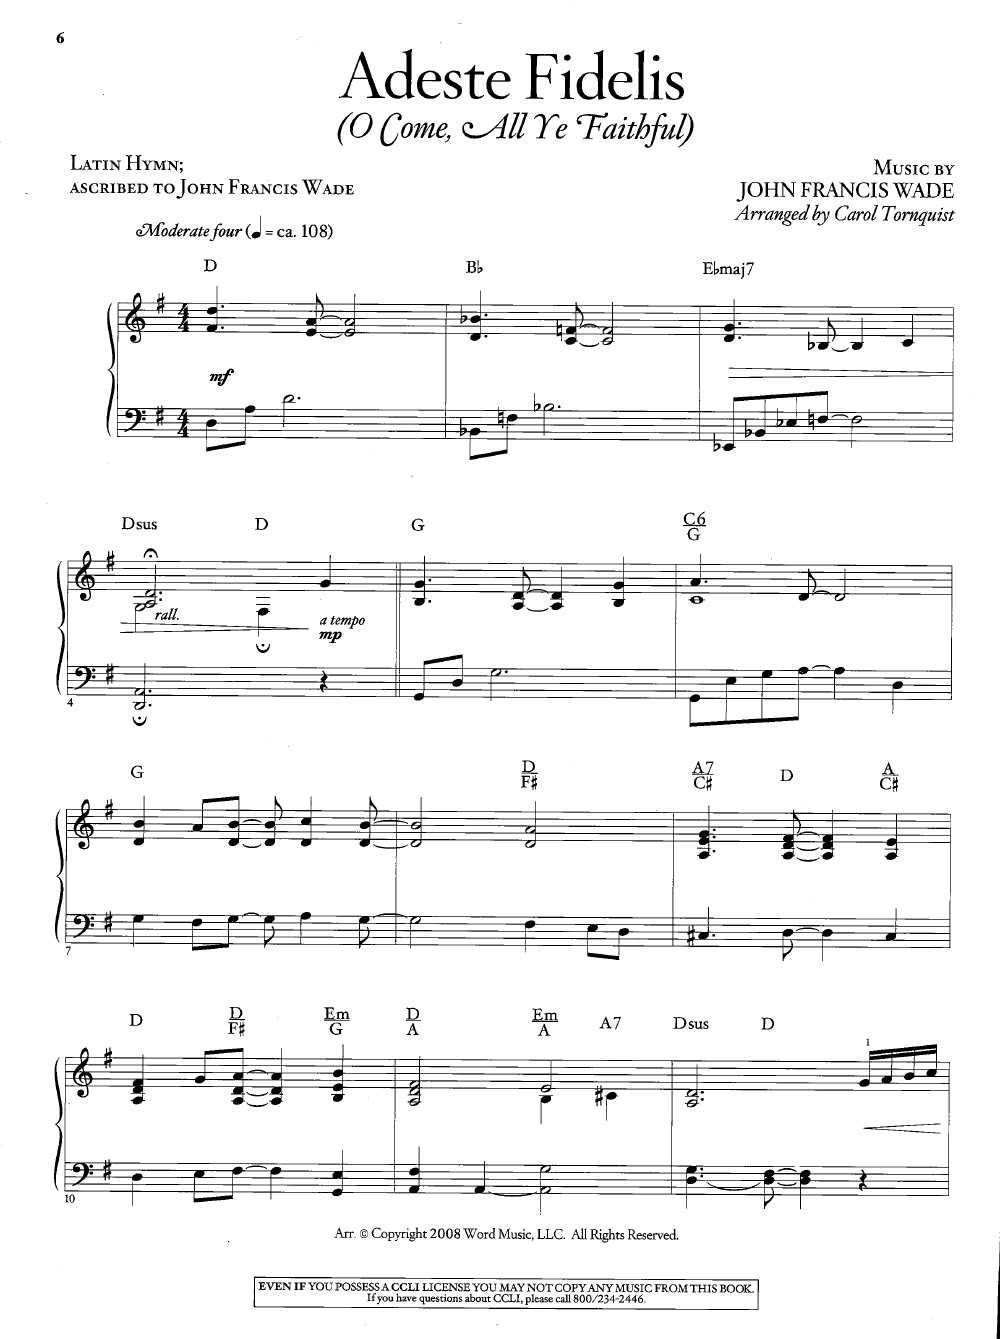 Top 25 Christmas Songs For Solo Piano ( Pian | J.w. Pepper Sheet Music - Christmas Songs Piano Sheet Music Free Printable